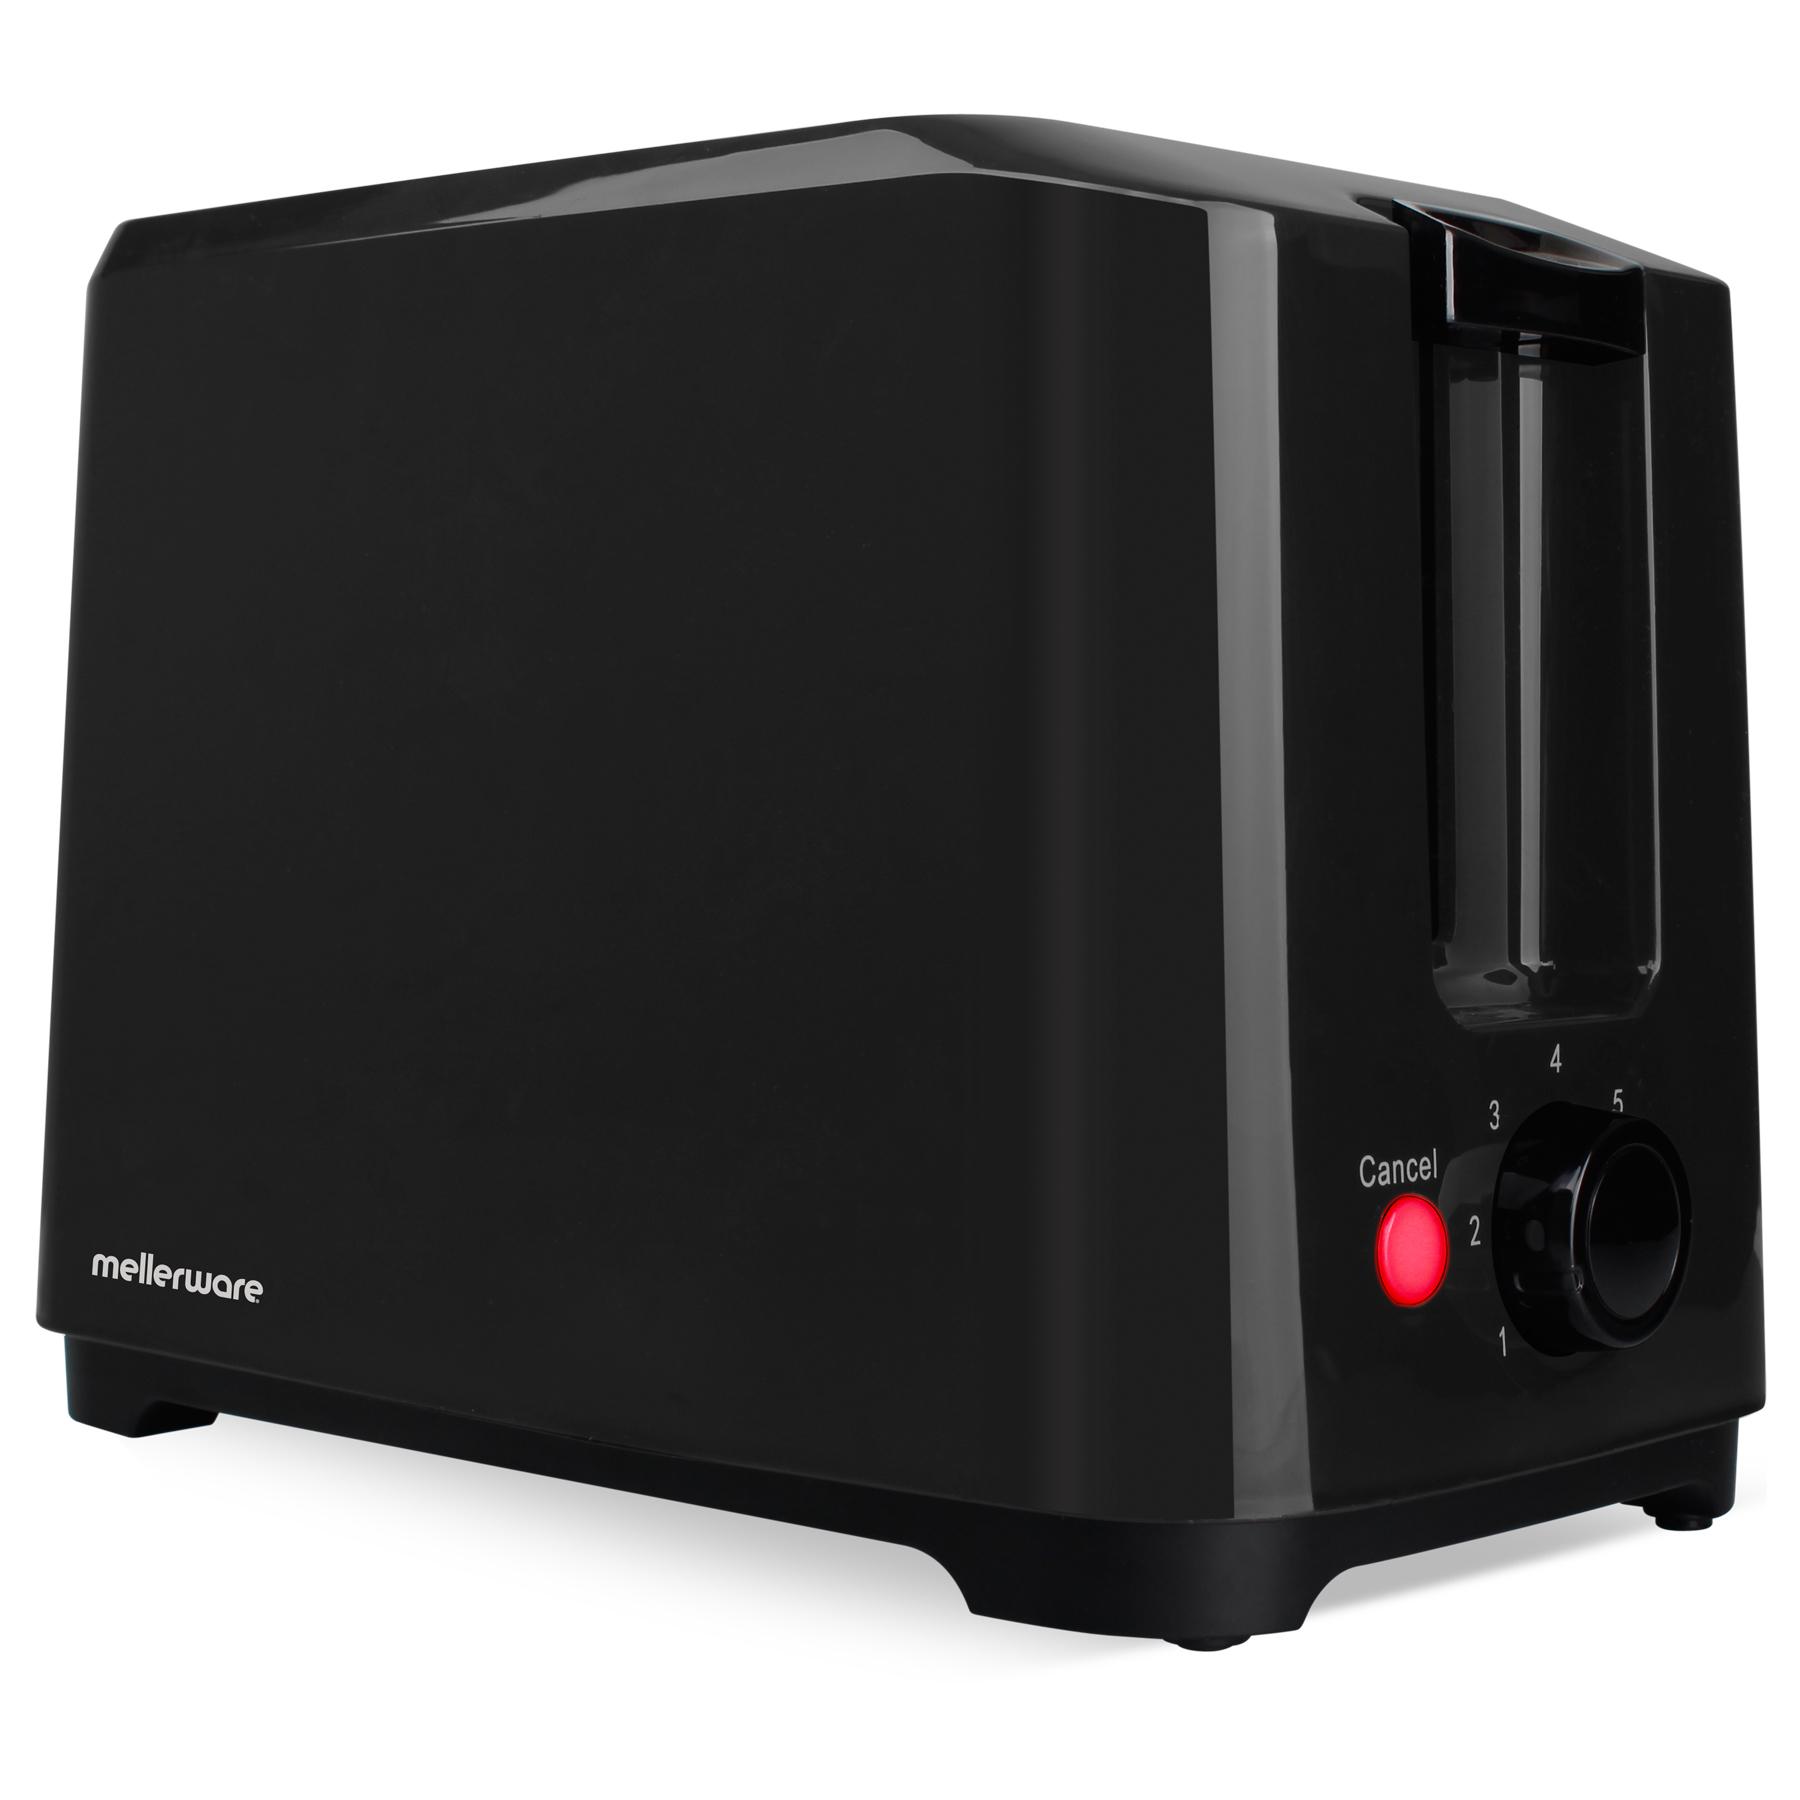 Mellerware Toaster 2 Slice Plastic Black